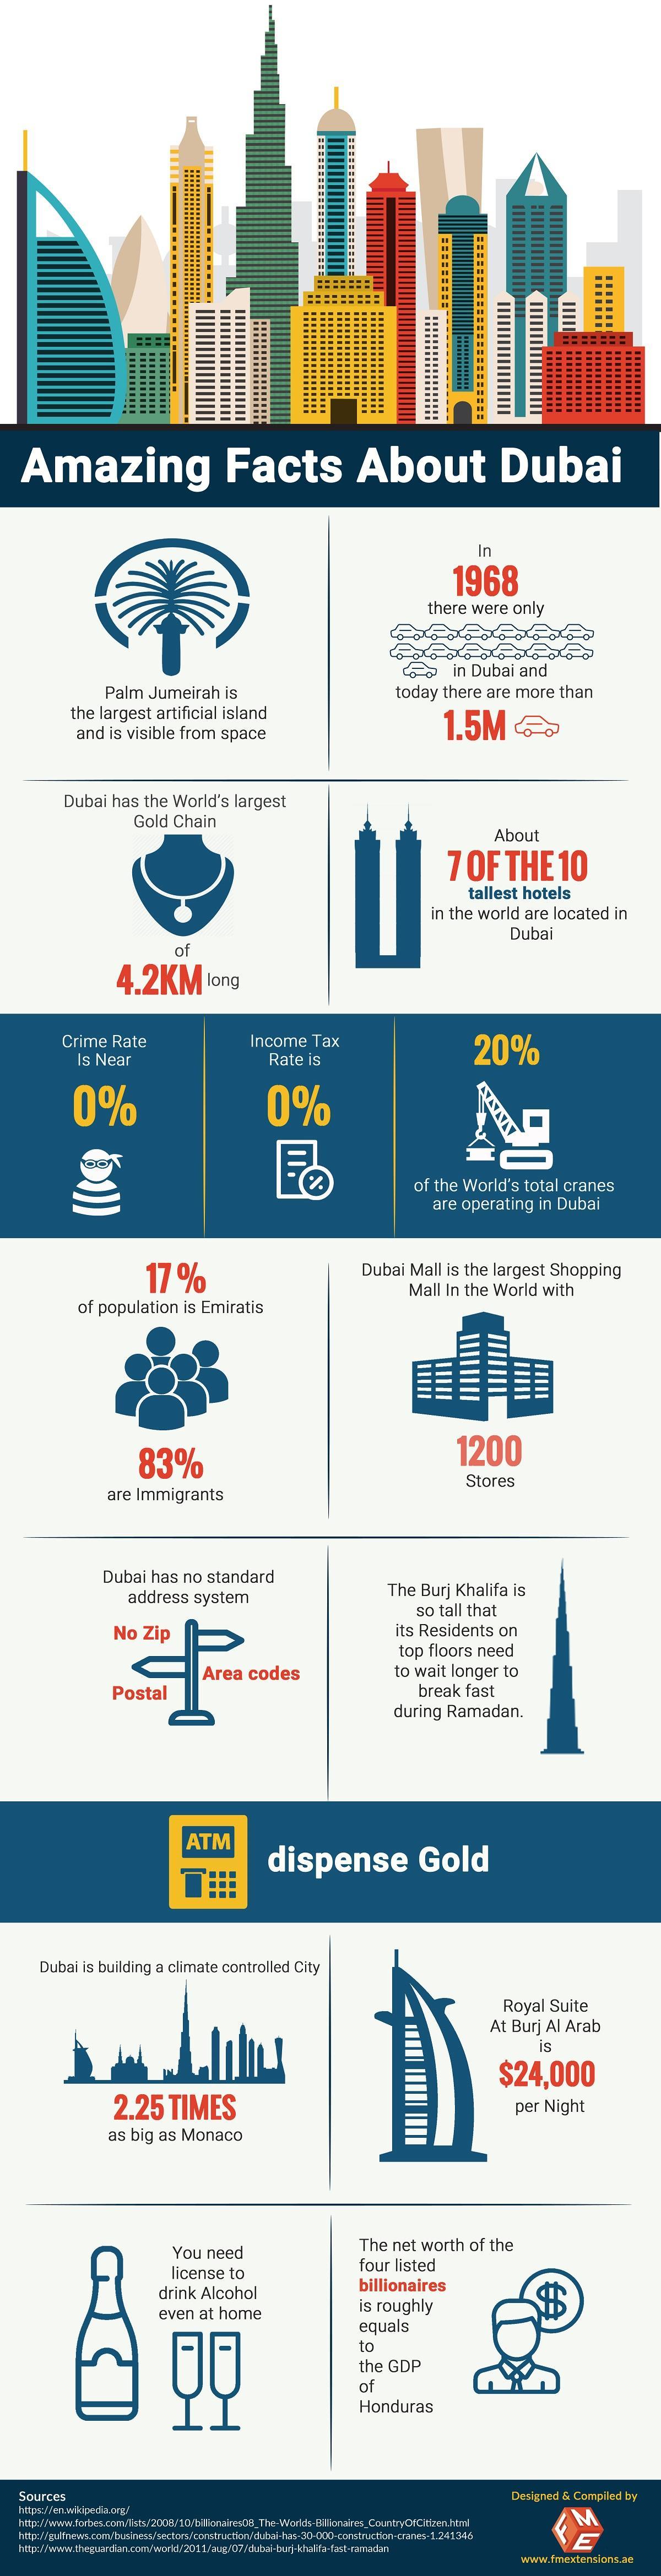 oasdom.com - amazing facts about Dubai